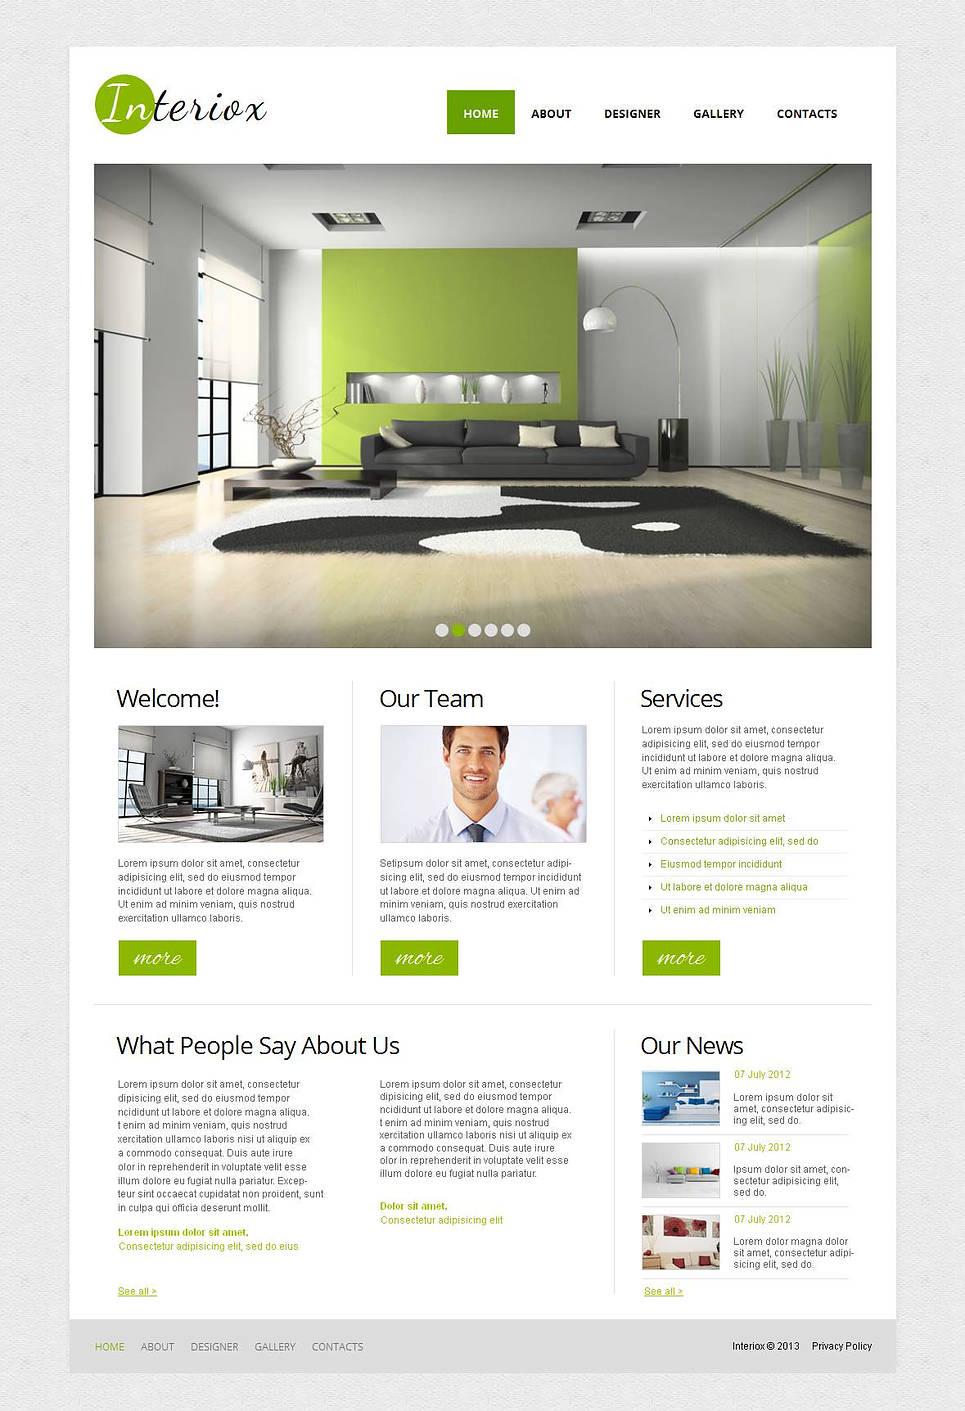 Minimalist Web Template for Interior Design Studios - image